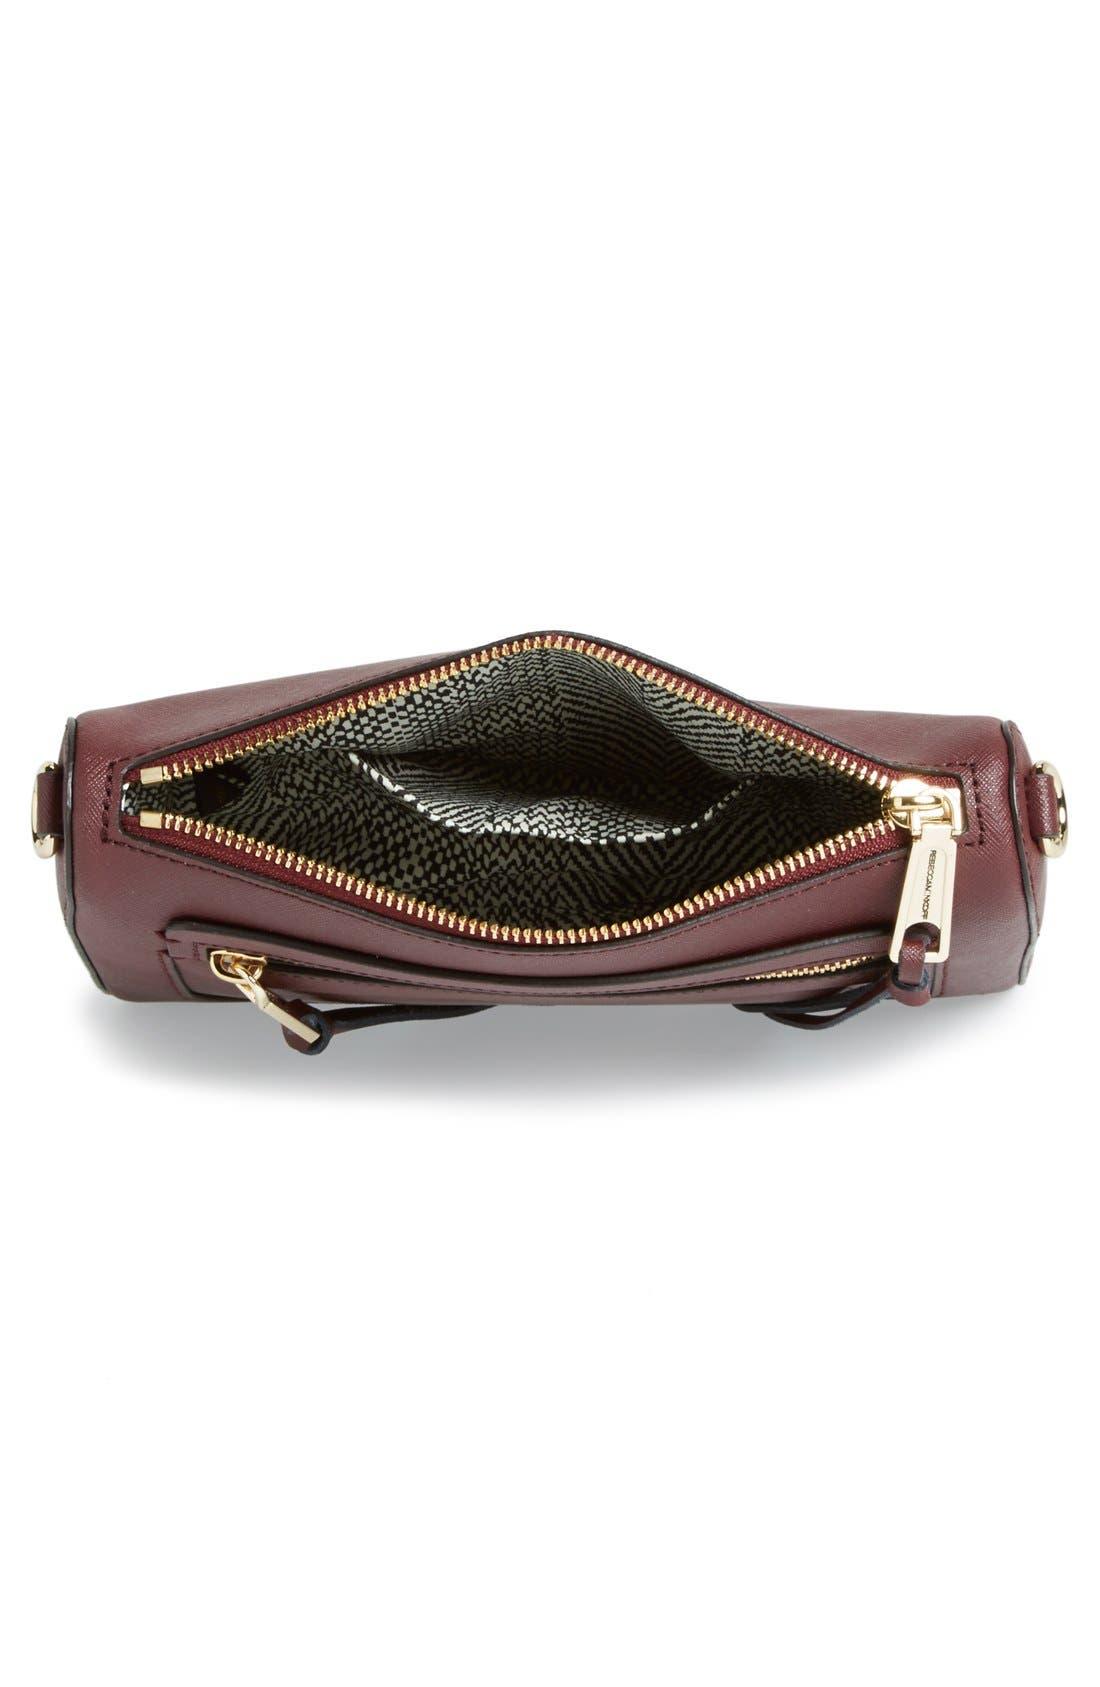 Alternate Image 3  - Rebecca Minkoff 'Avery' Convertible Crossbody Bag